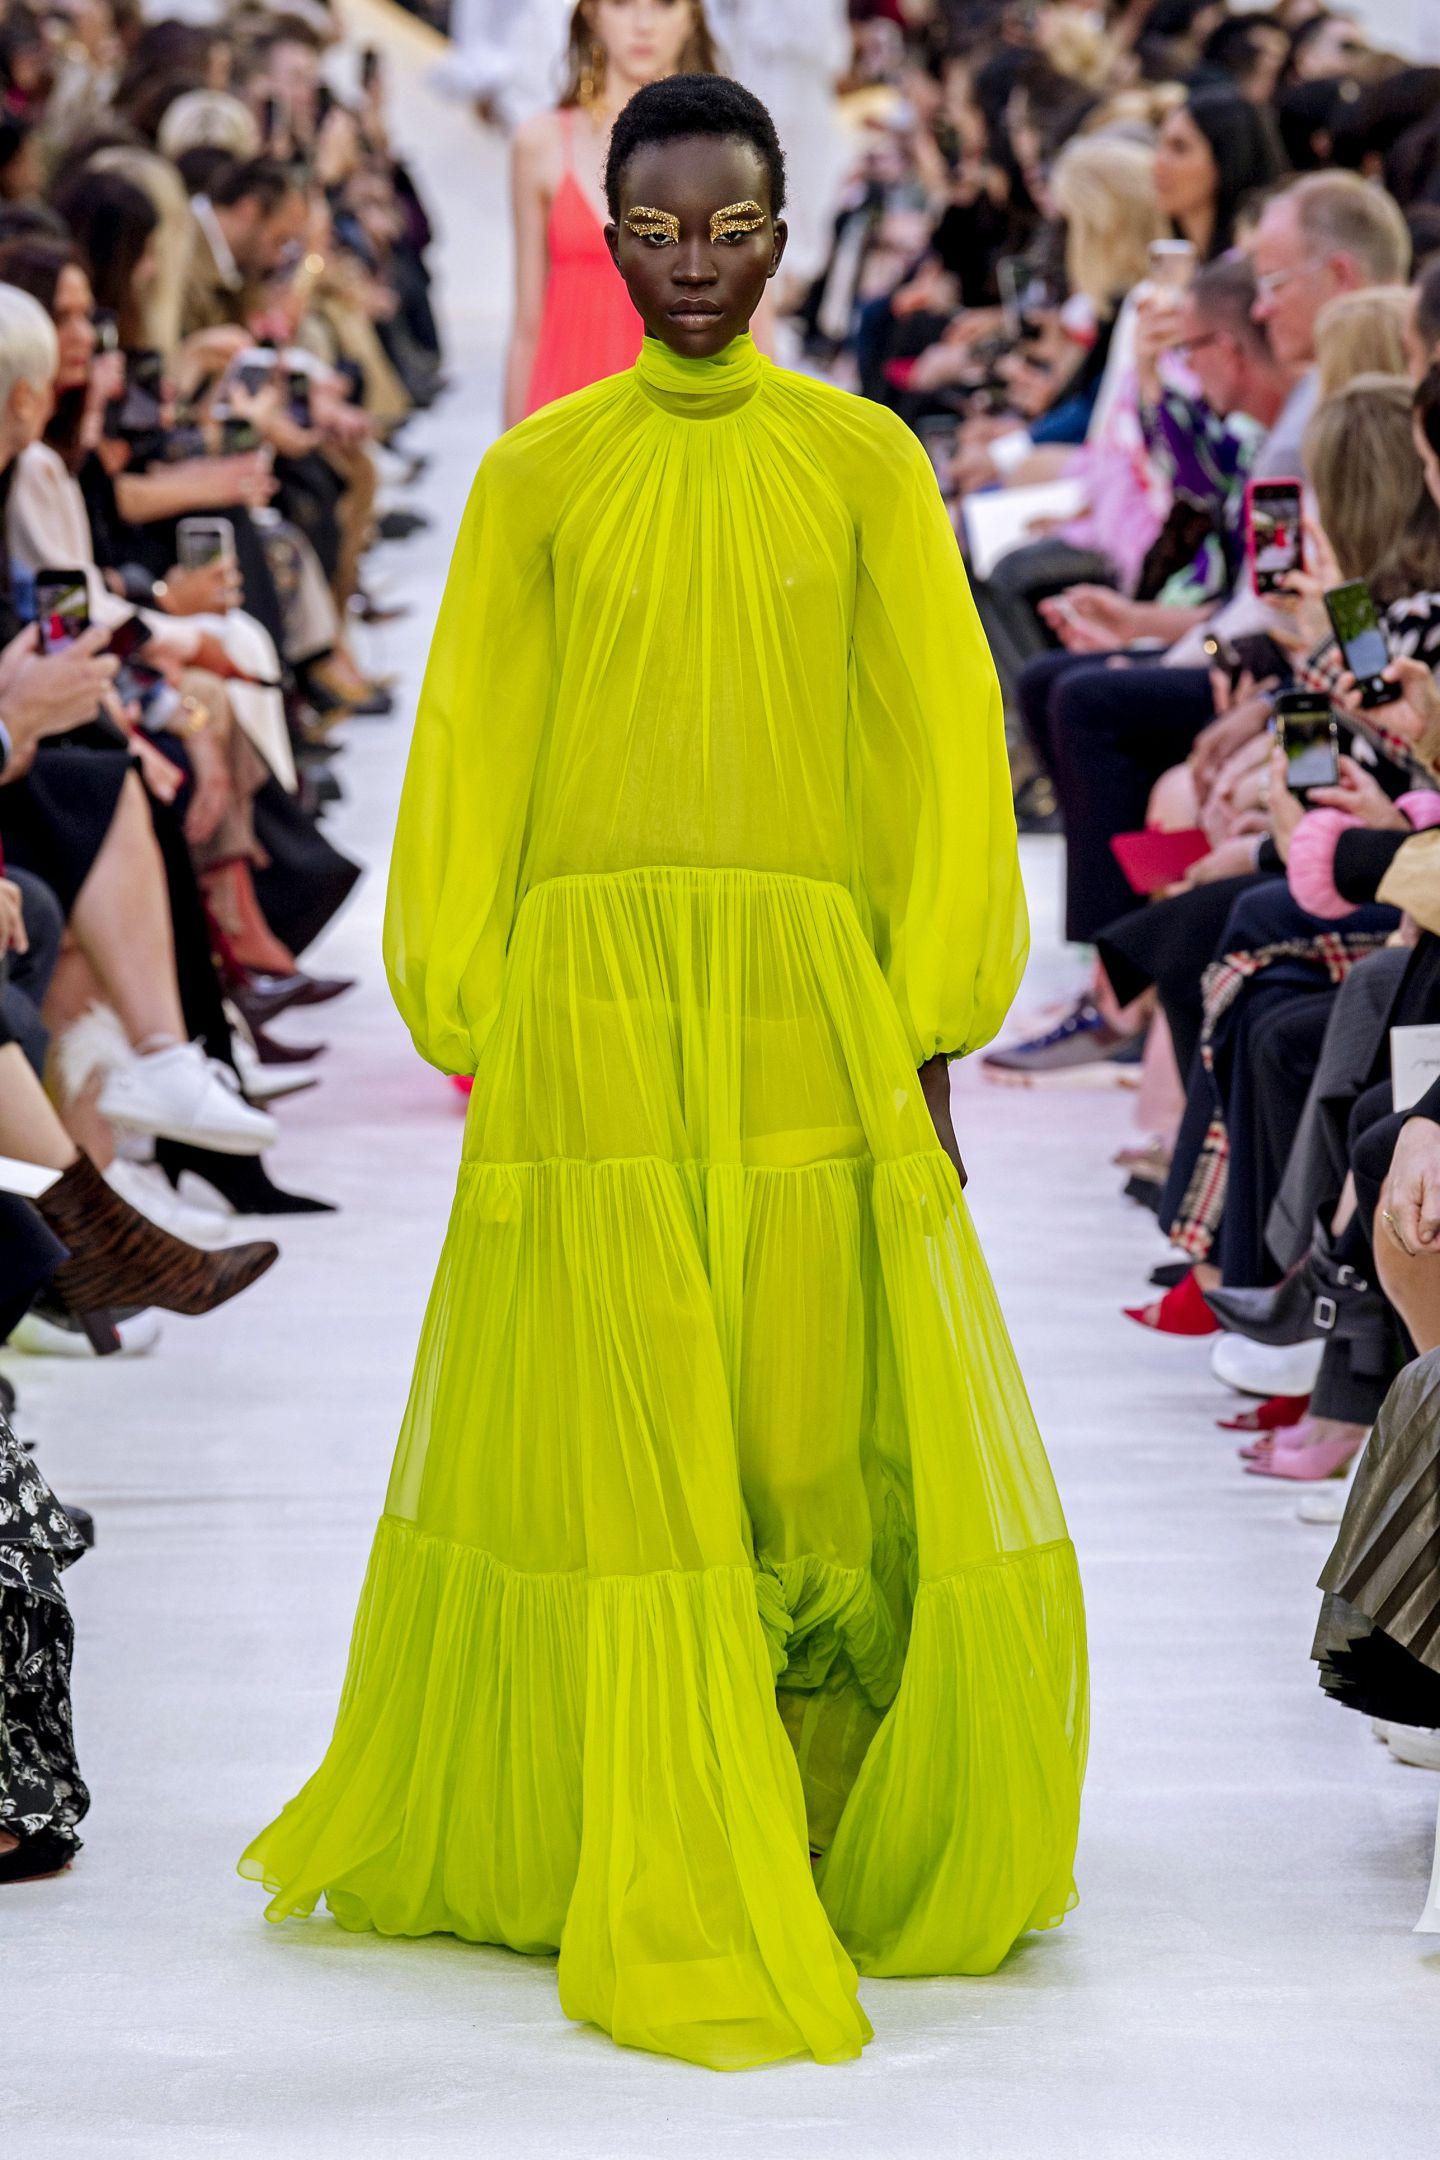 Fashion, Fashion model, Runway, Fashion show, Clothing, Yellow, Haute couture, Shoulder, Dress, Event,